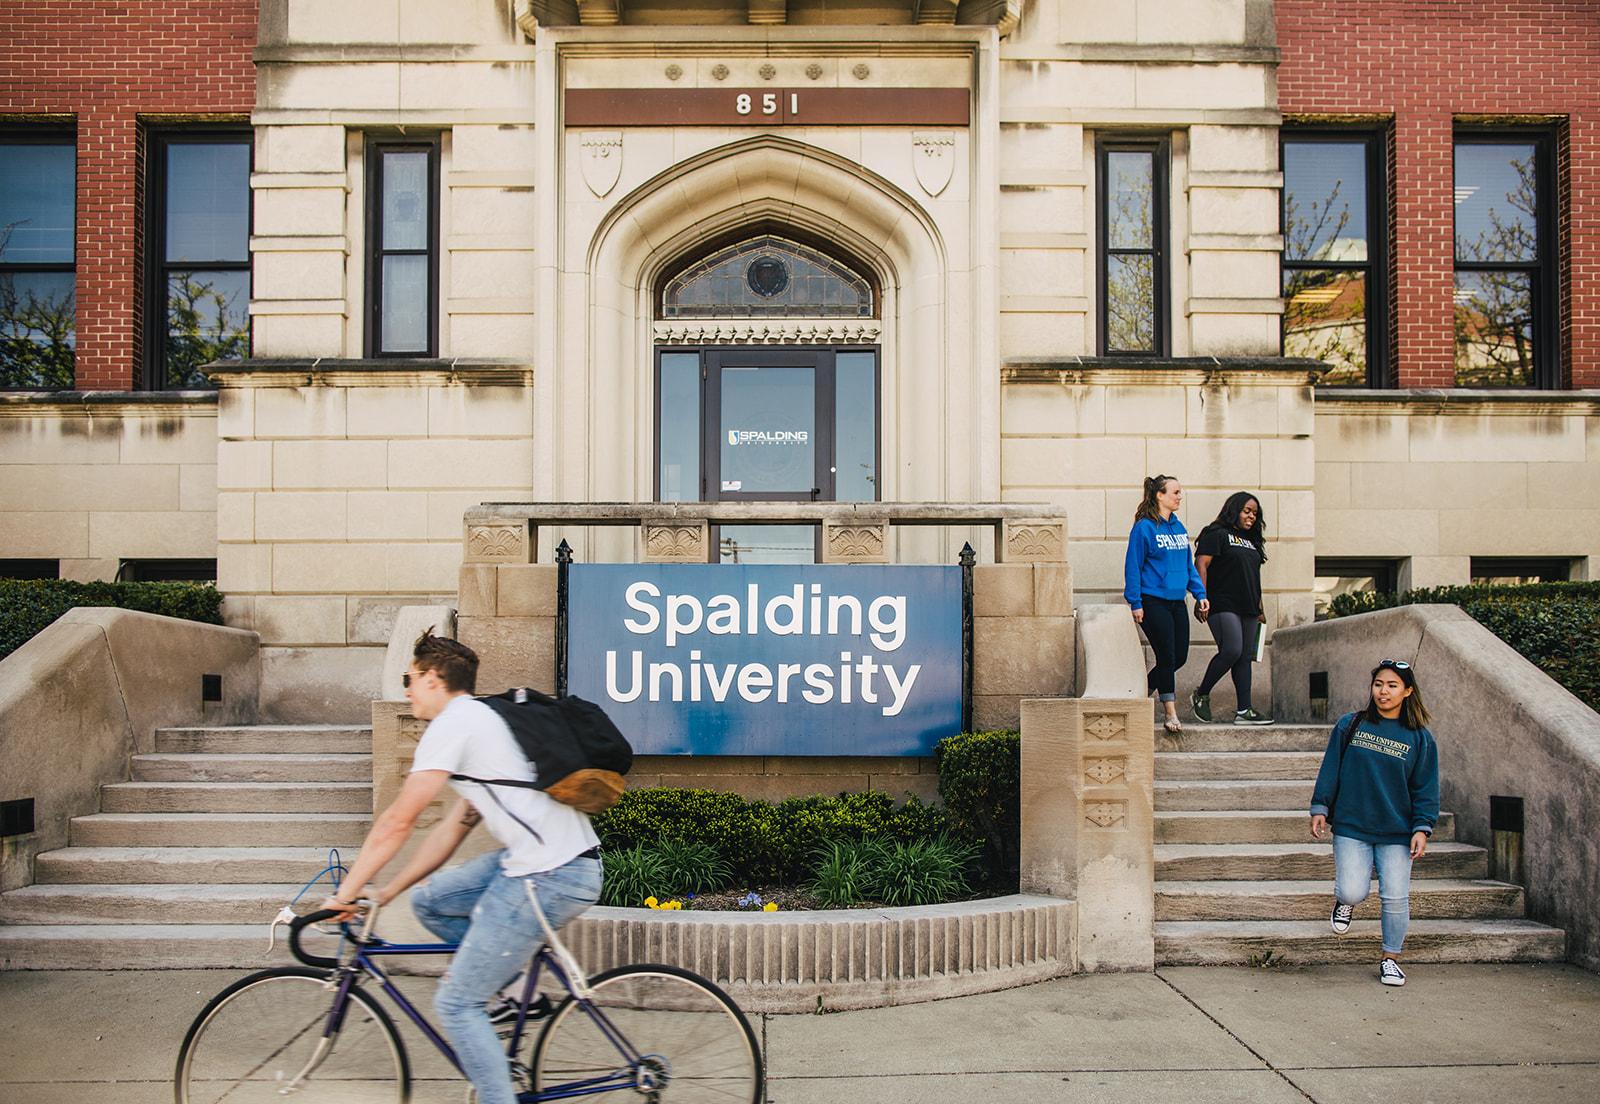 Student rides bike past Spalding Mansion complex entrance